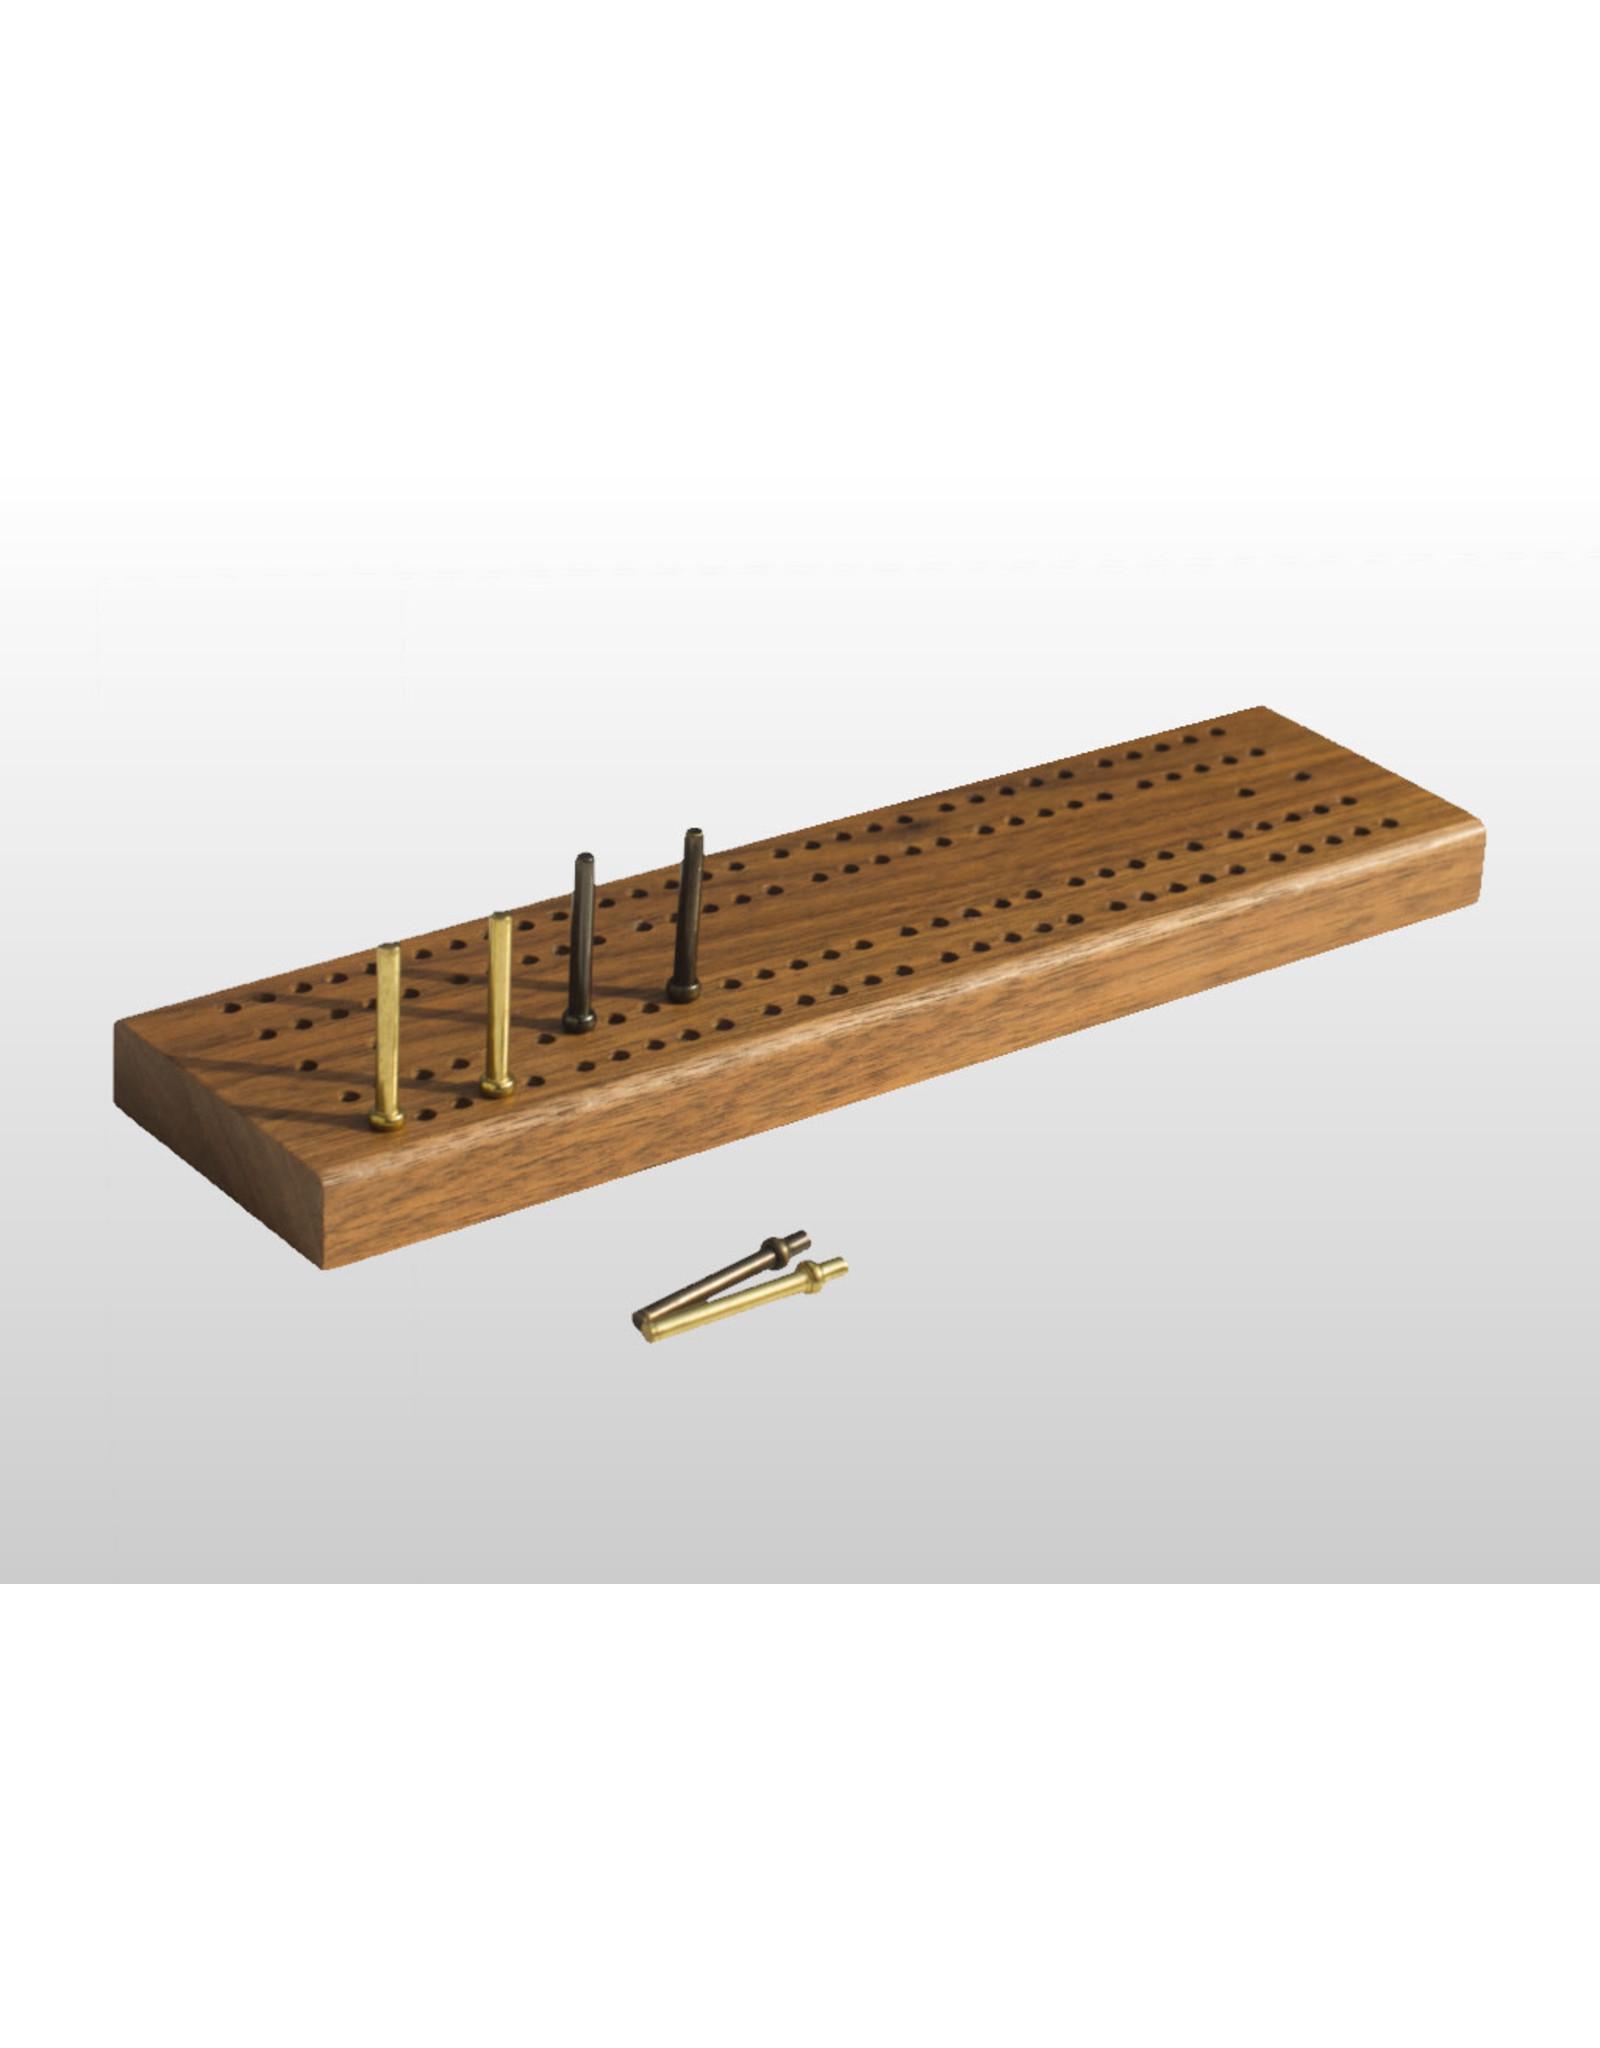 Alex Cramer Co. Cribbage Board